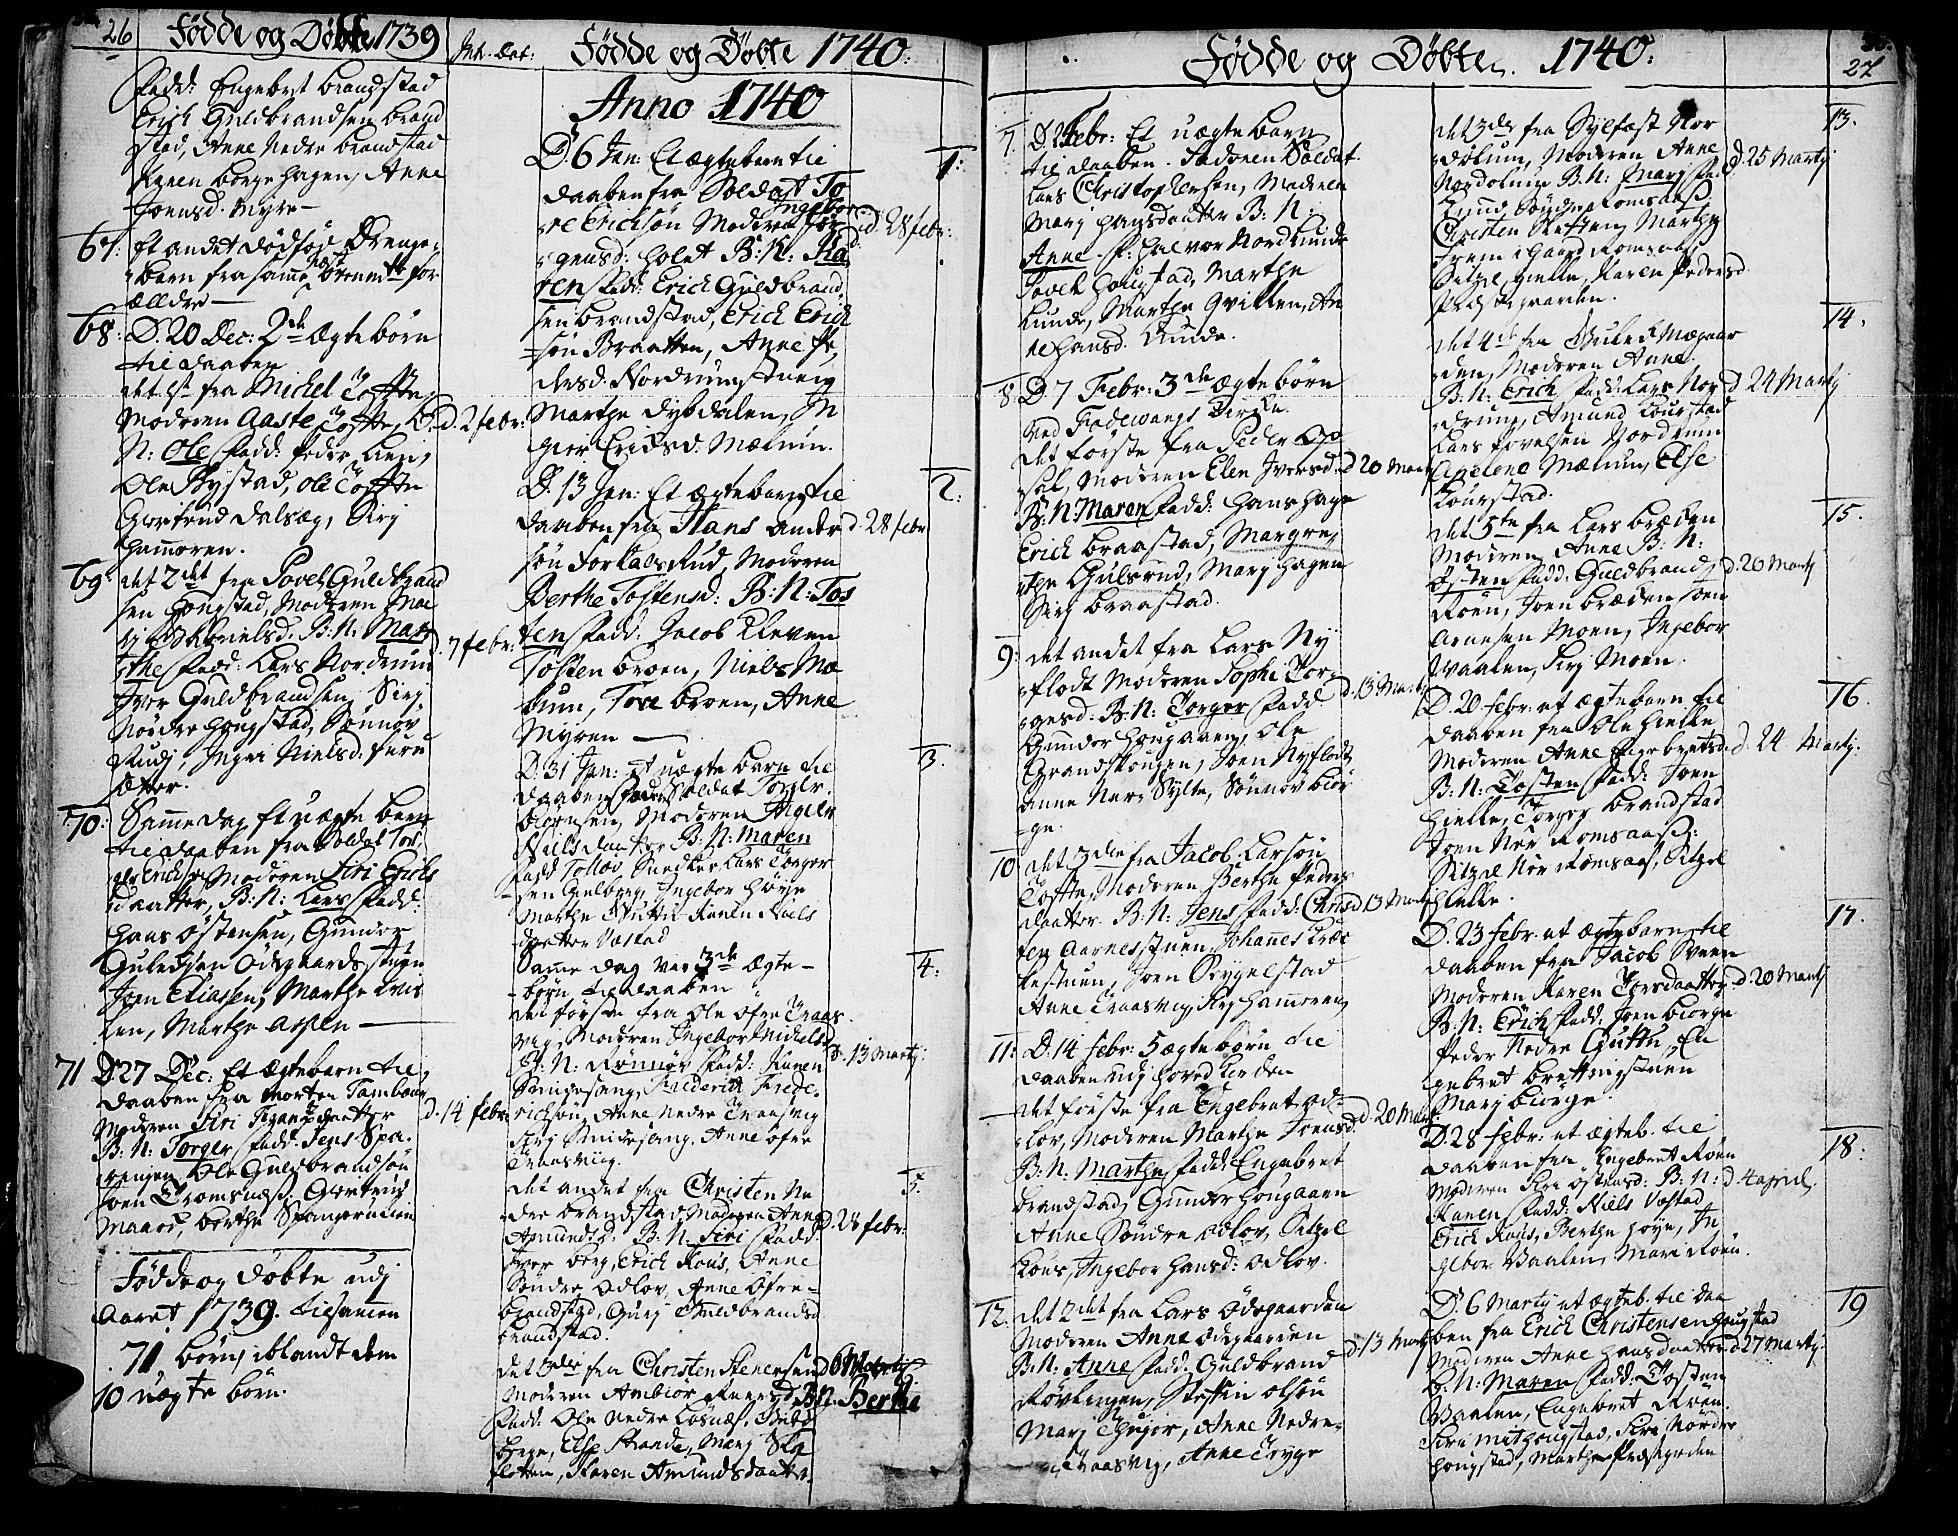 SAH, Ringebu prestekontor, Ministerialbok nr. 2, 1734-1780, s. 26-27